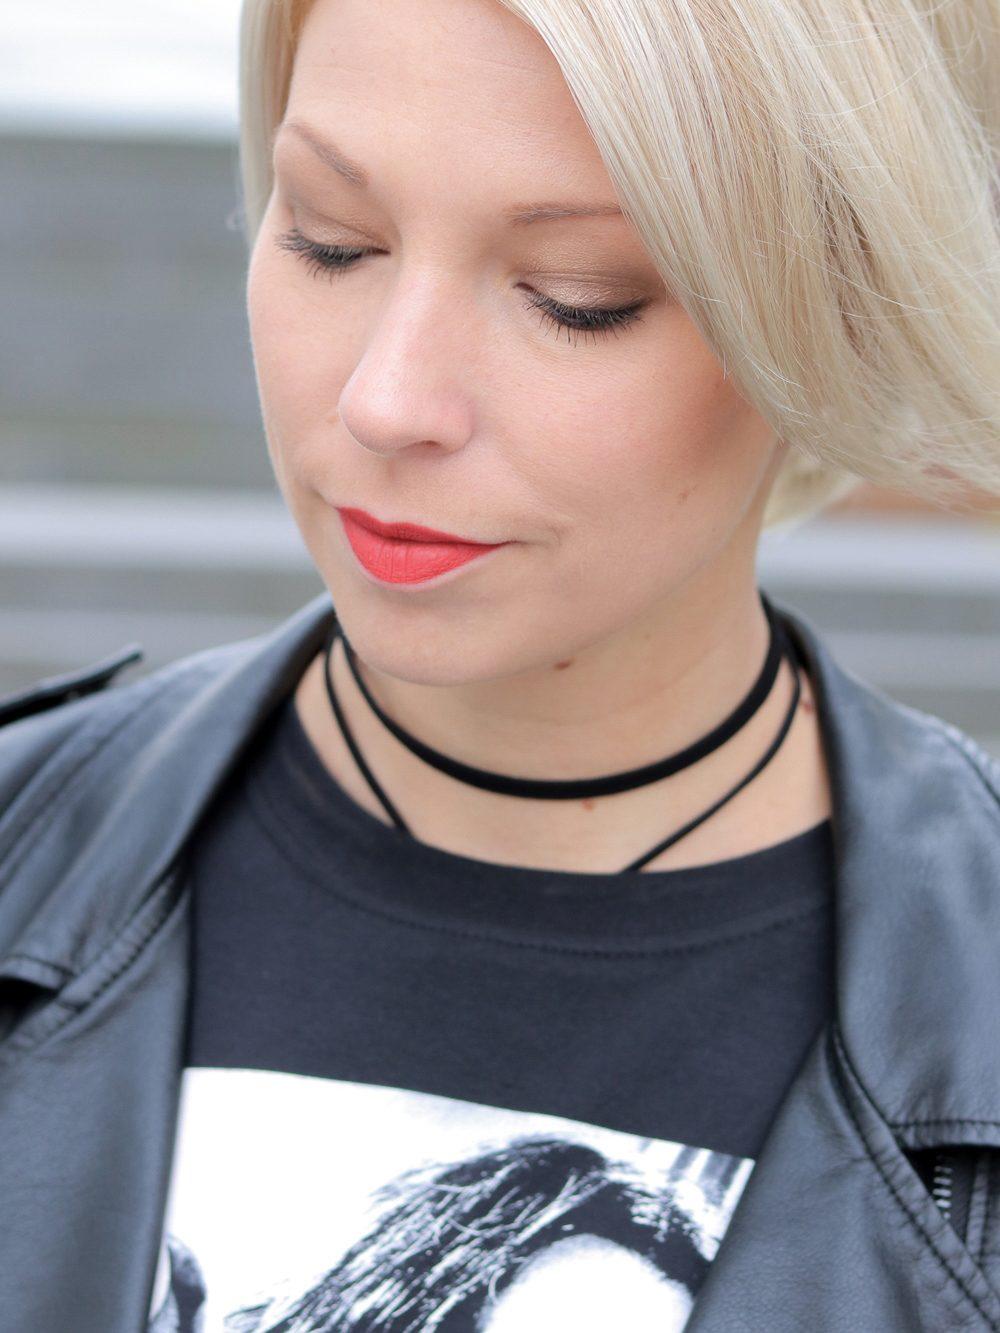 fashionblogger-heidelberg-outfit-shirt-snape-jeansshorts-chucks-lederjacke-15-von-15